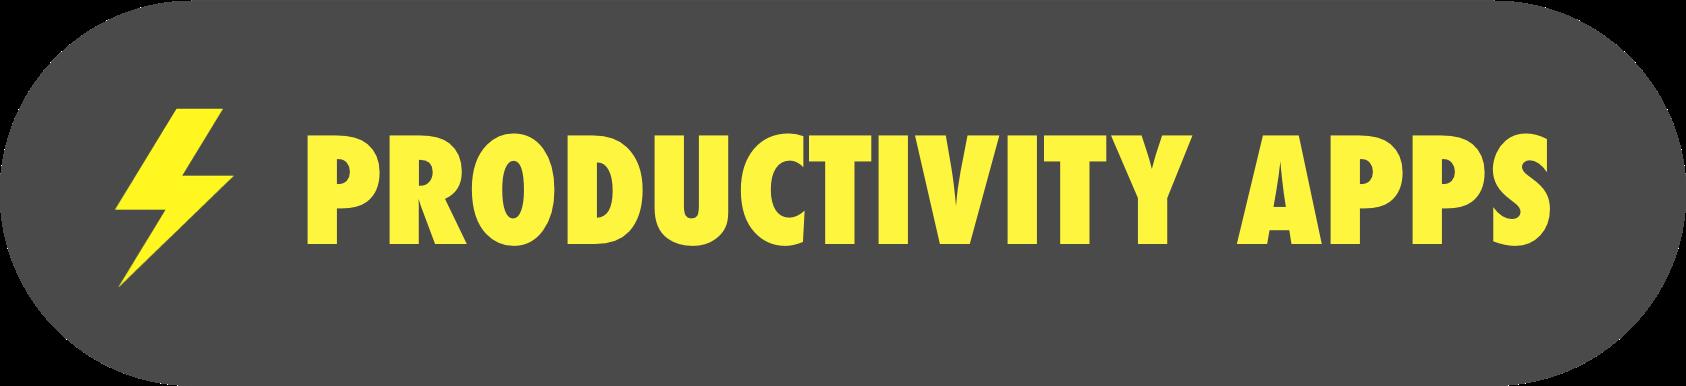 Productivity apps header